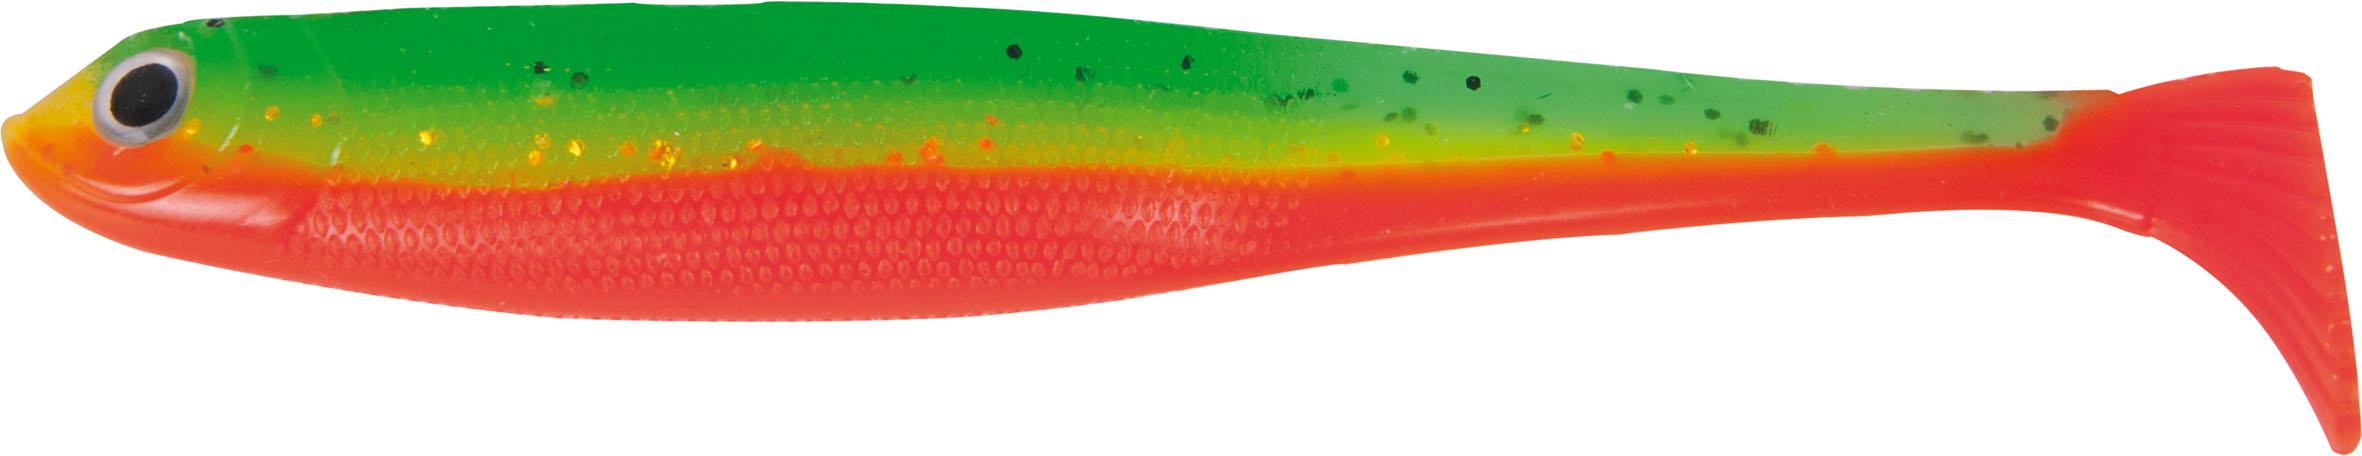 Iron Claw gumová nástraha Slim Jim 13 cm Vzor OB, 3ks